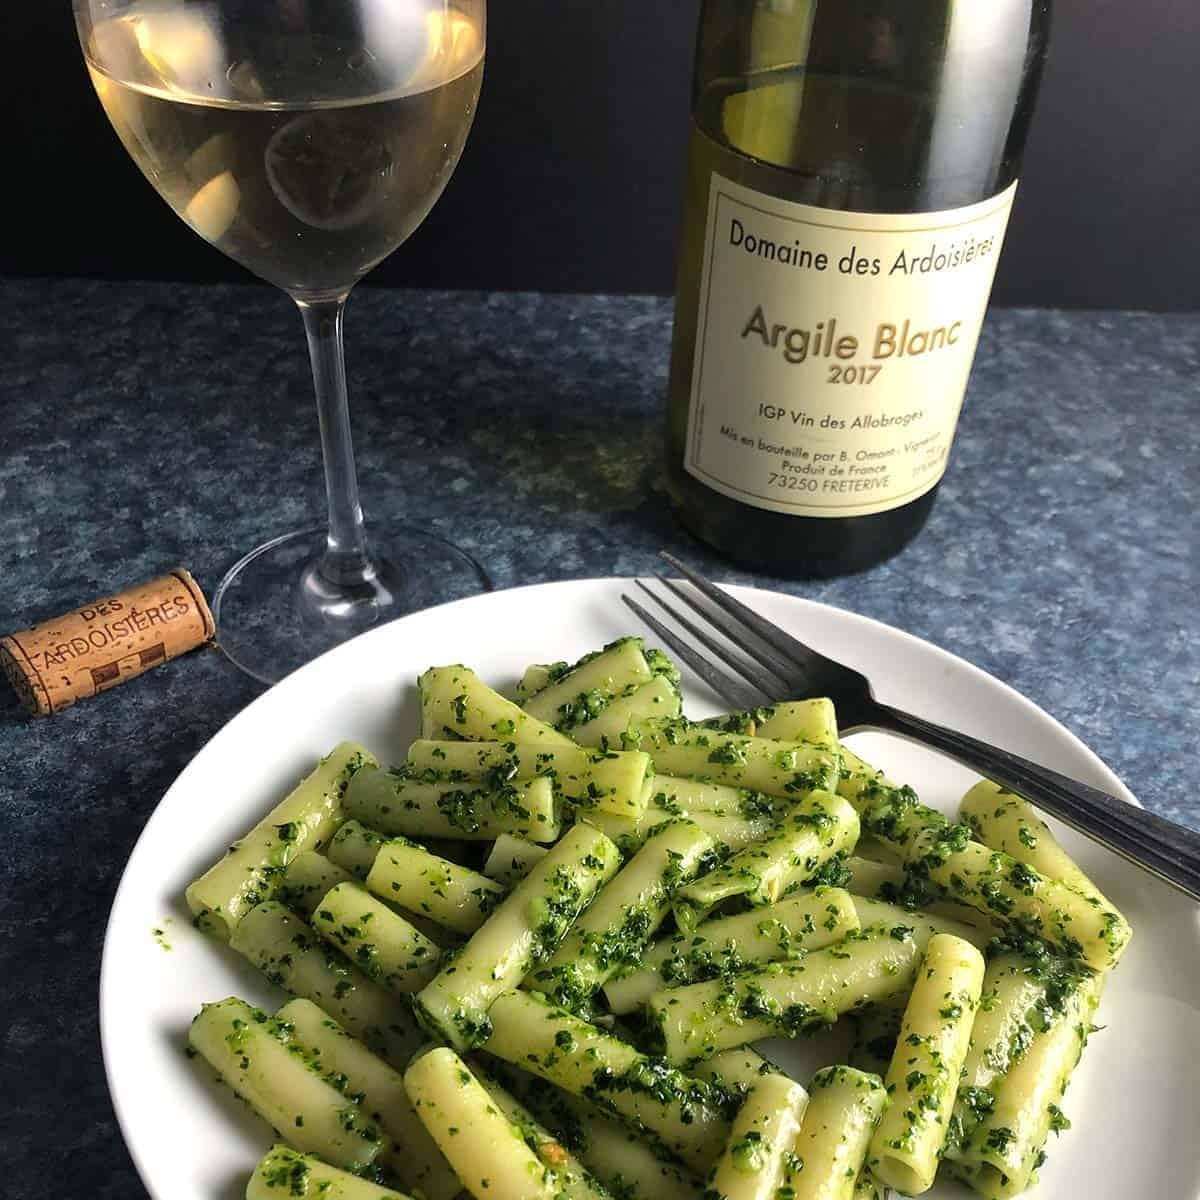 Argile Blanc paired with kale pesto pasta.